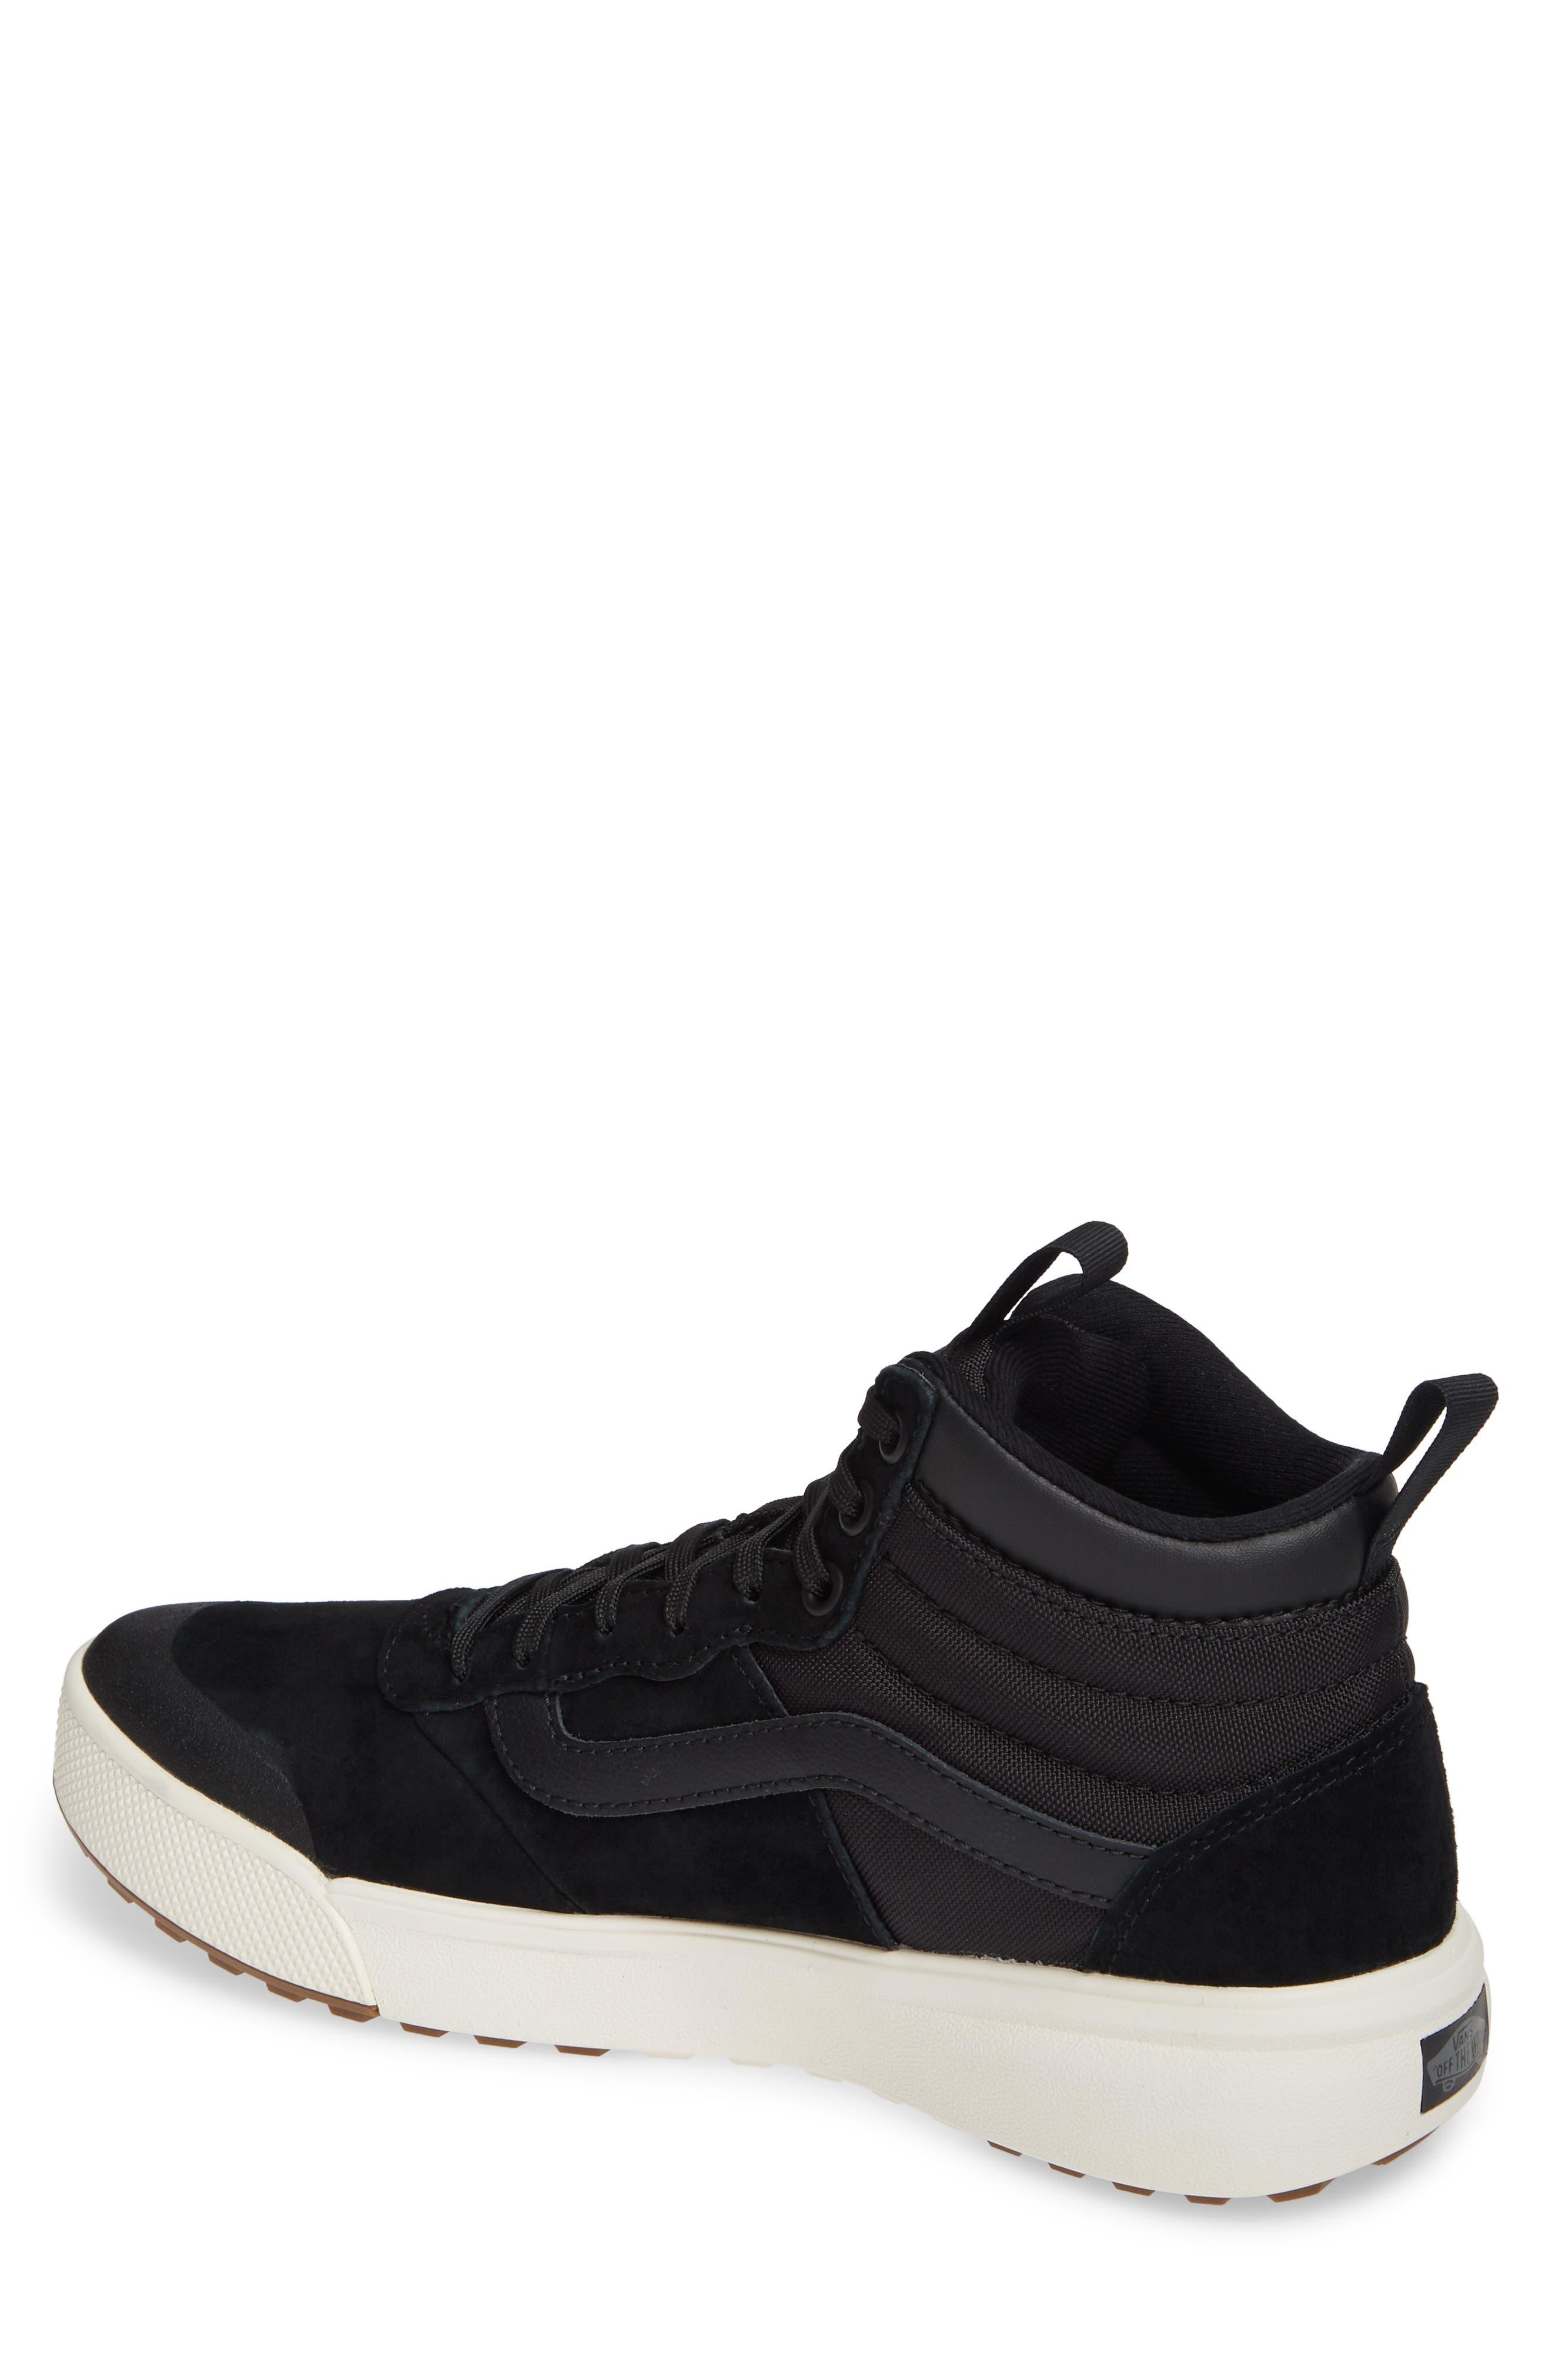 Ultrarange Hi Sneaker,                             Alternate thumbnail 2, color,                             BLACK